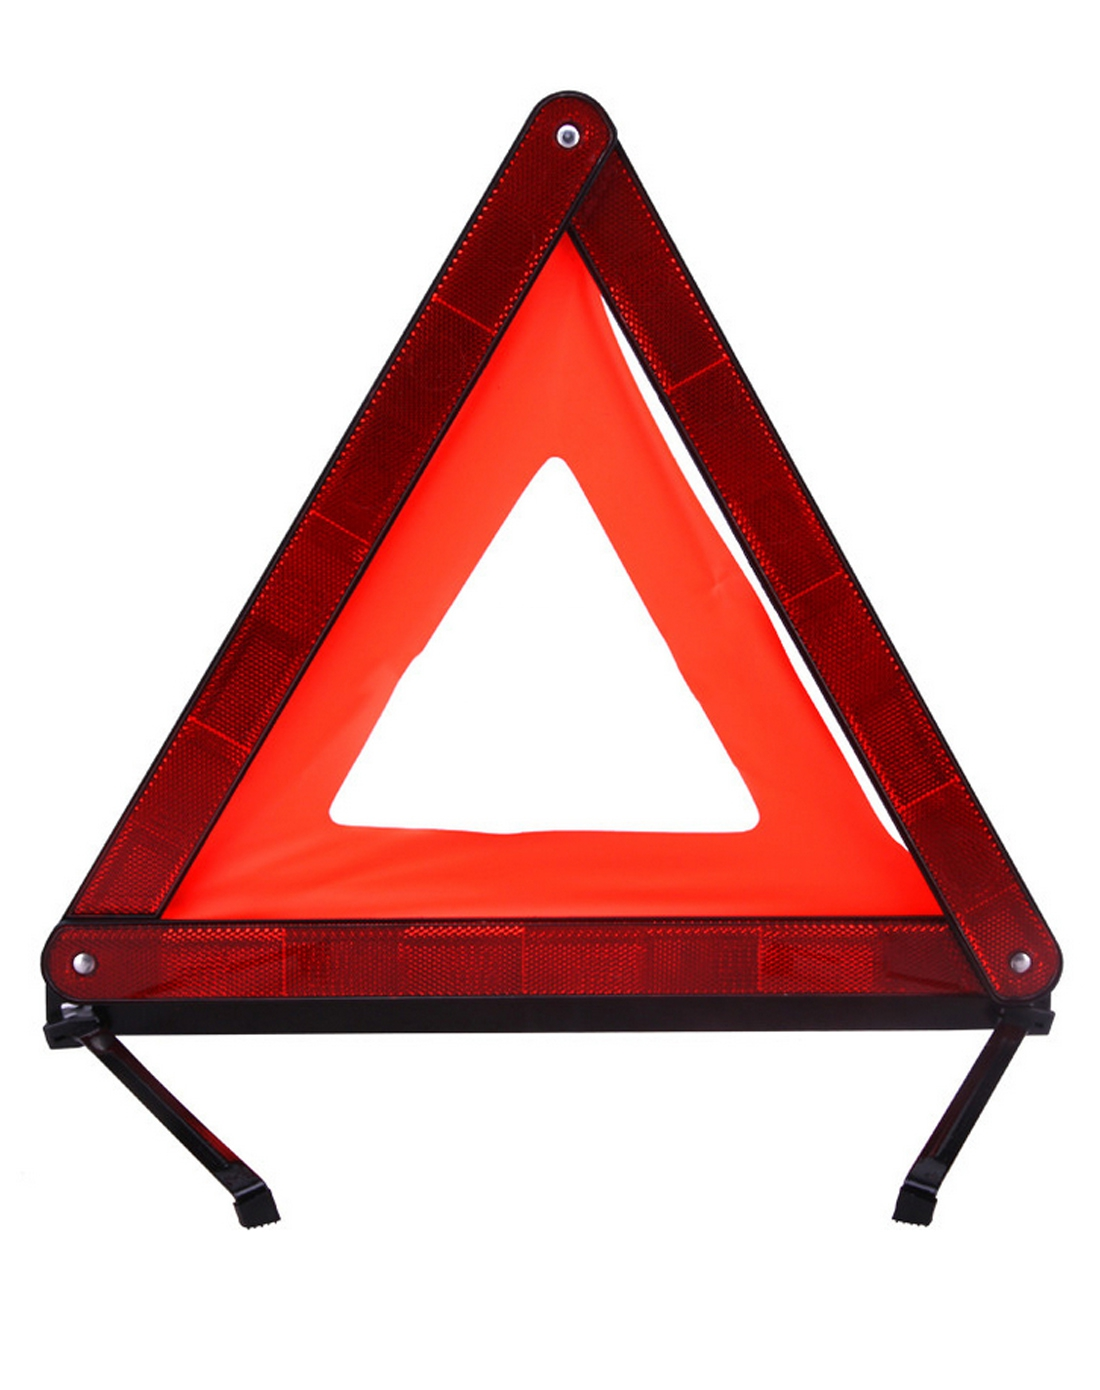 erill/依然 车用三角反光警示牌